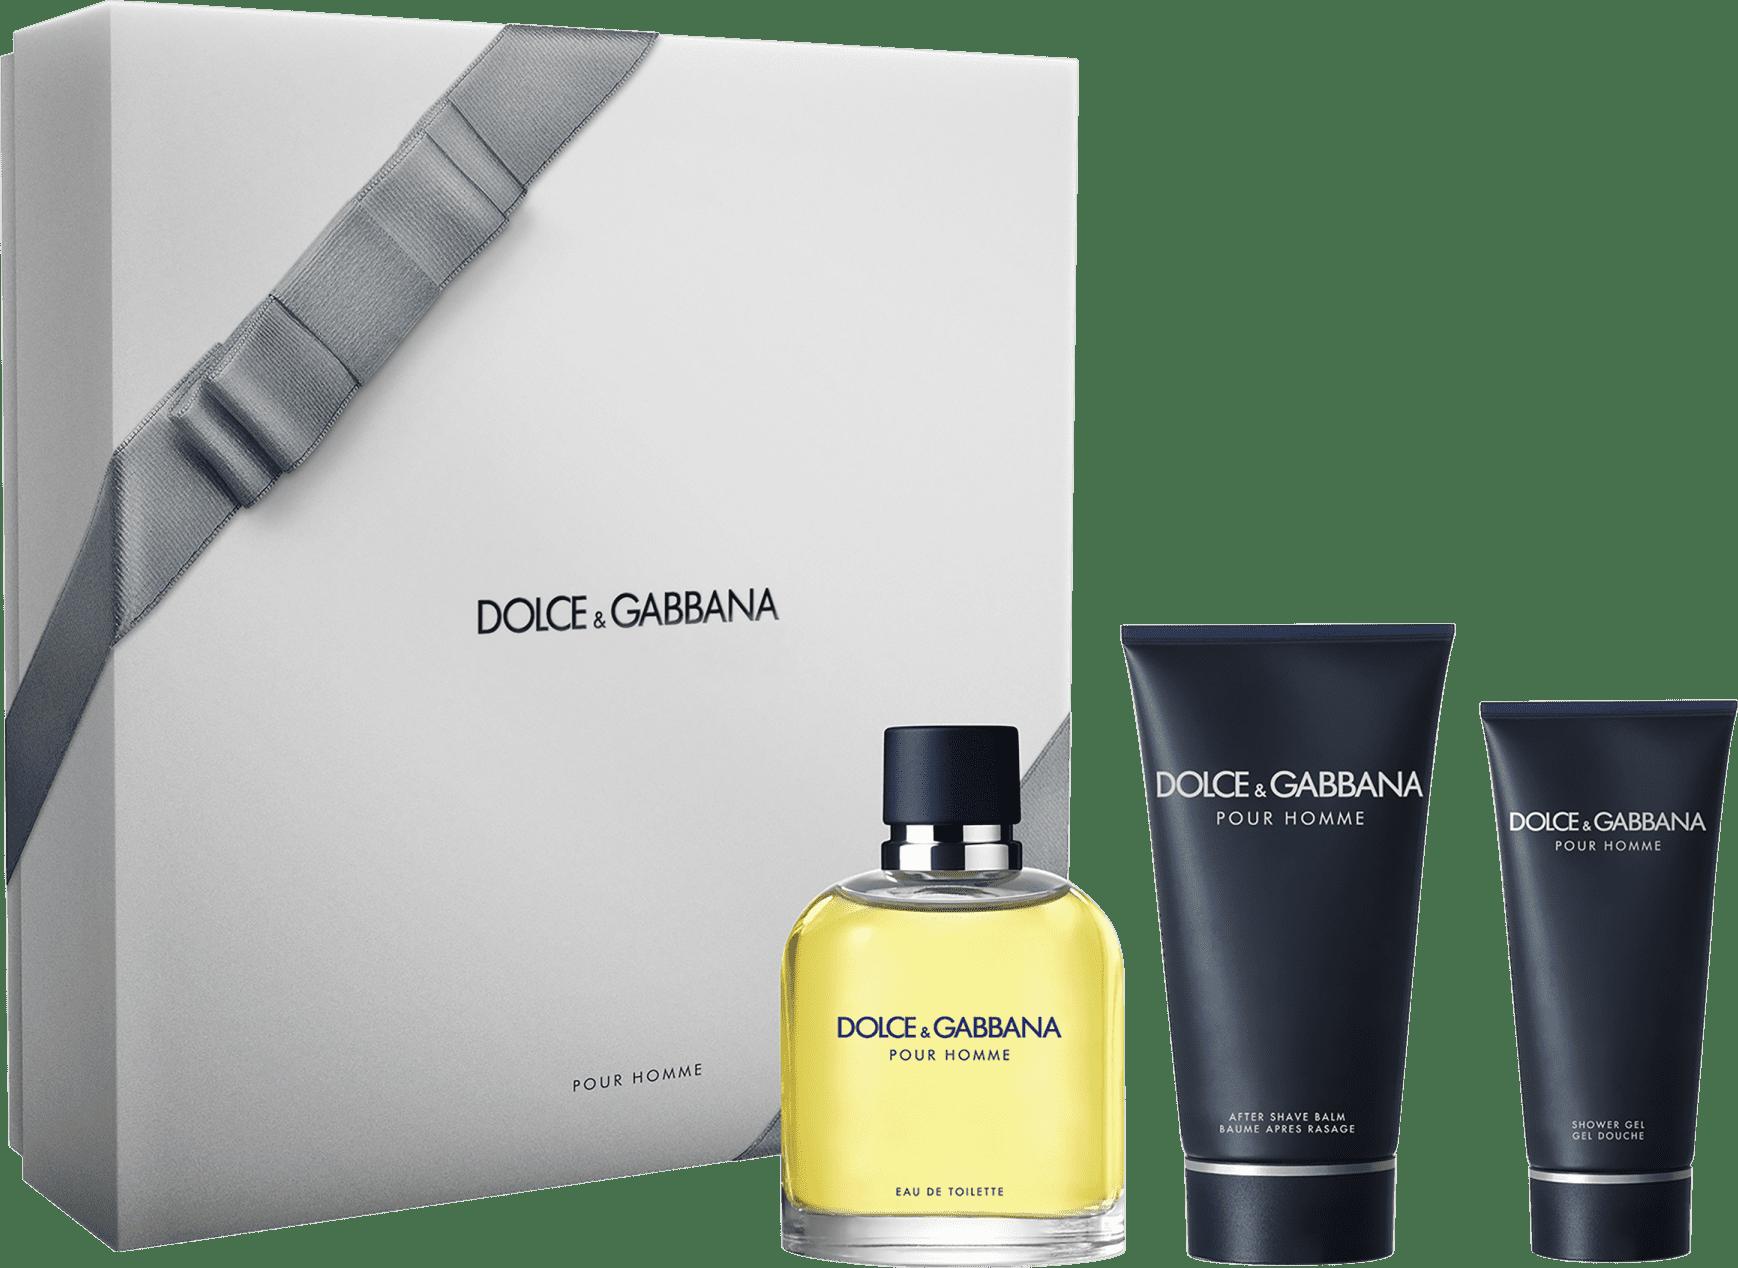 Conjunto Dolce   Gabbana Pour Homme Masculino - Eau de Toilette 125ml +  Pós-Barba 639889e940